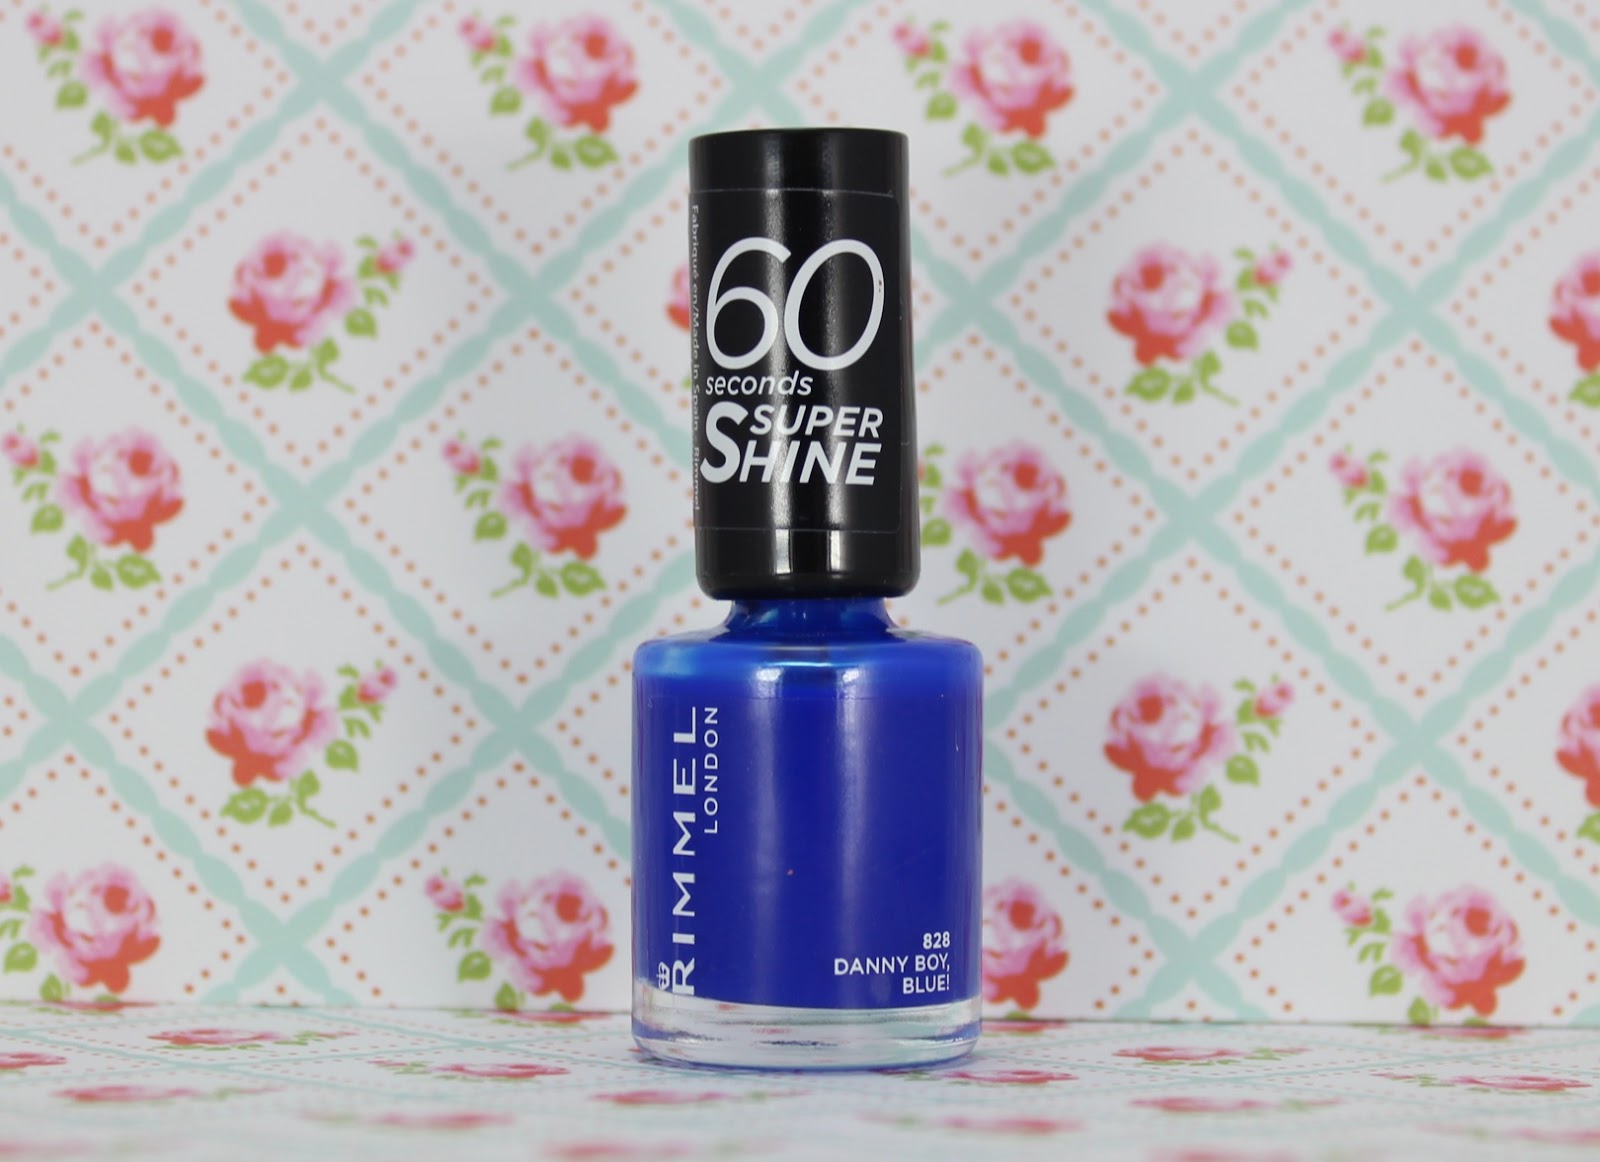 rimmel Danny Boy, Blue! nail polish